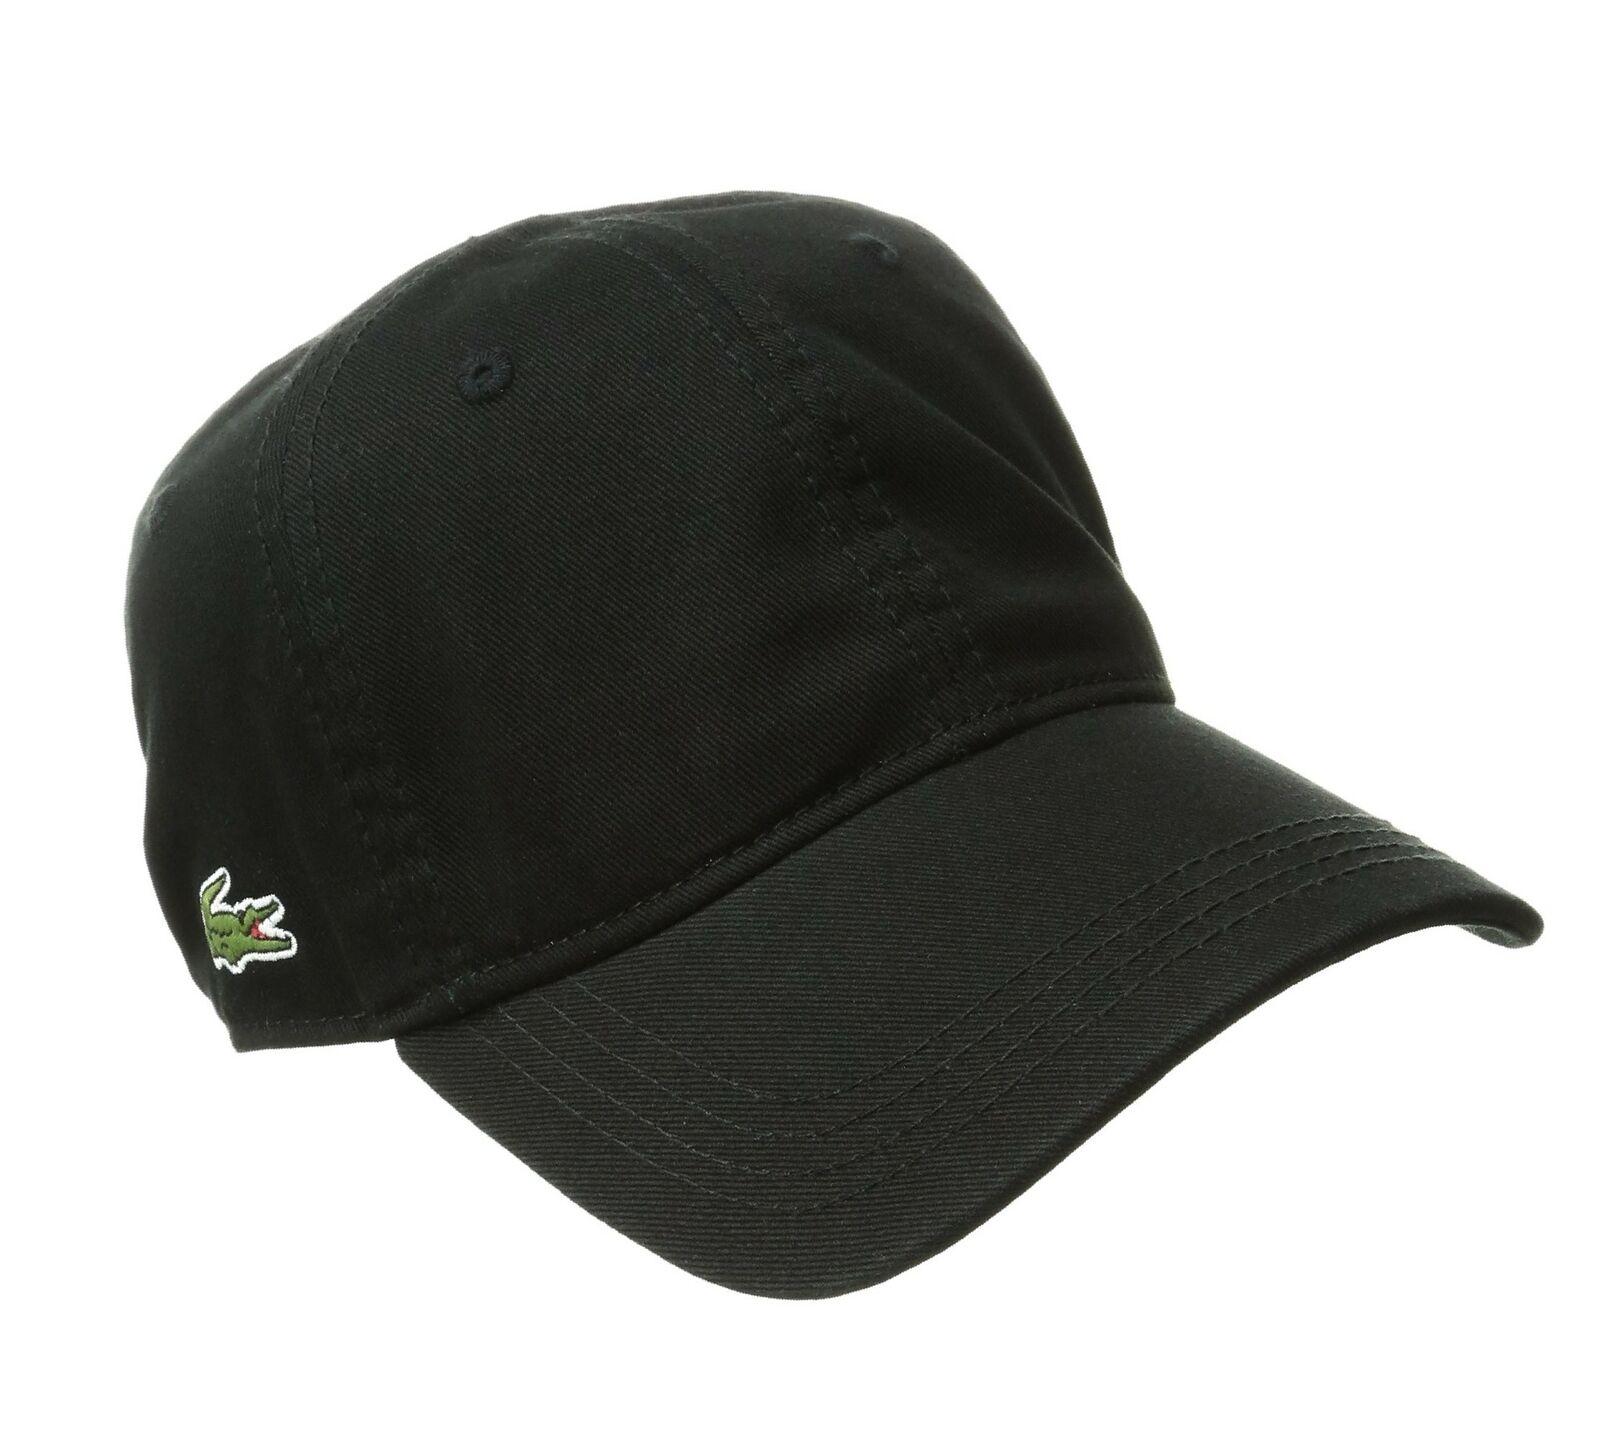 e0faf34e Lacoste Men's Cotton Gabardine Cap with Signature Green Croc Black One Size